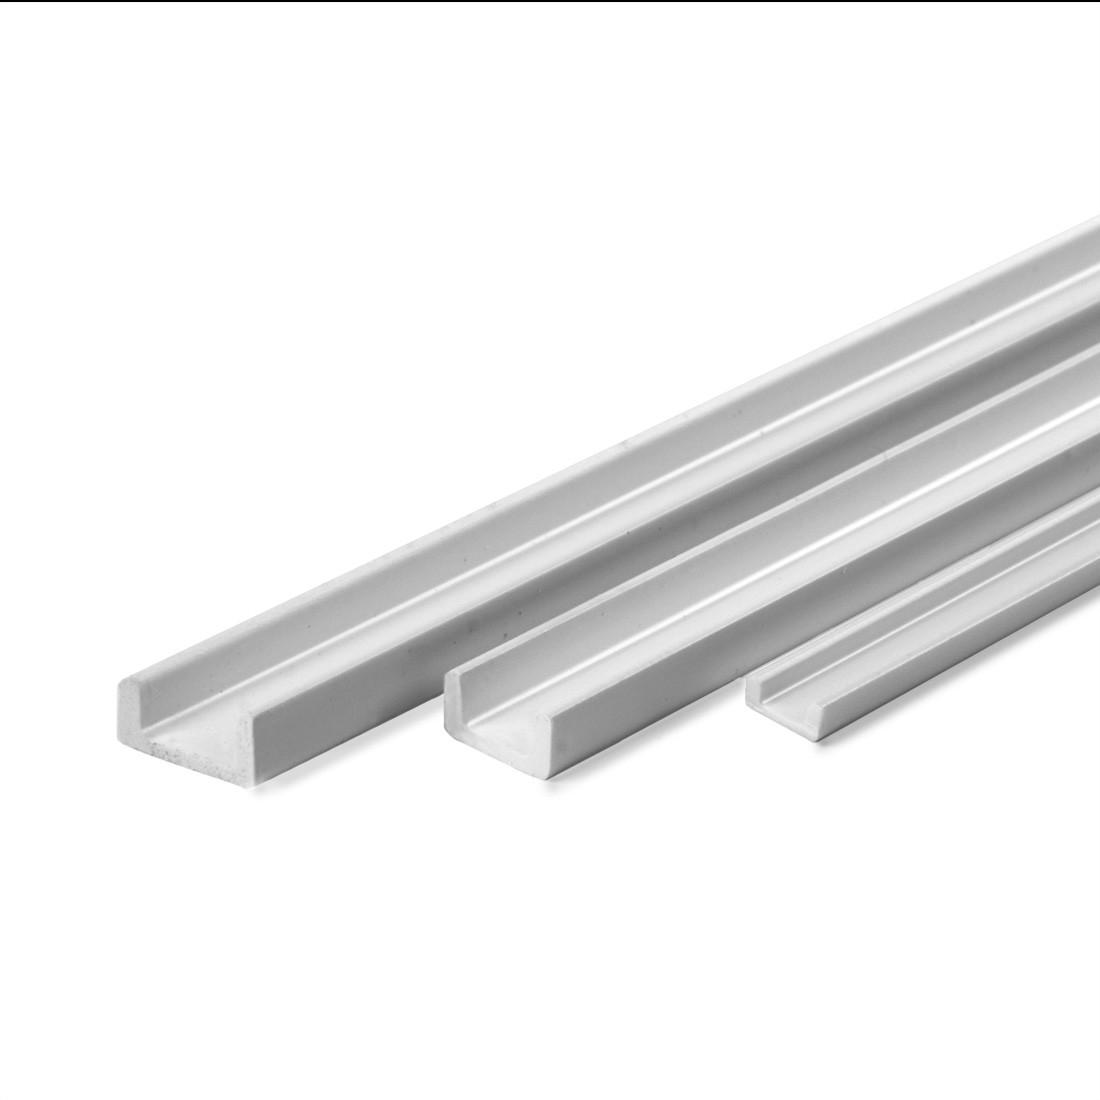 Profile ASA C mm.2x4x1000